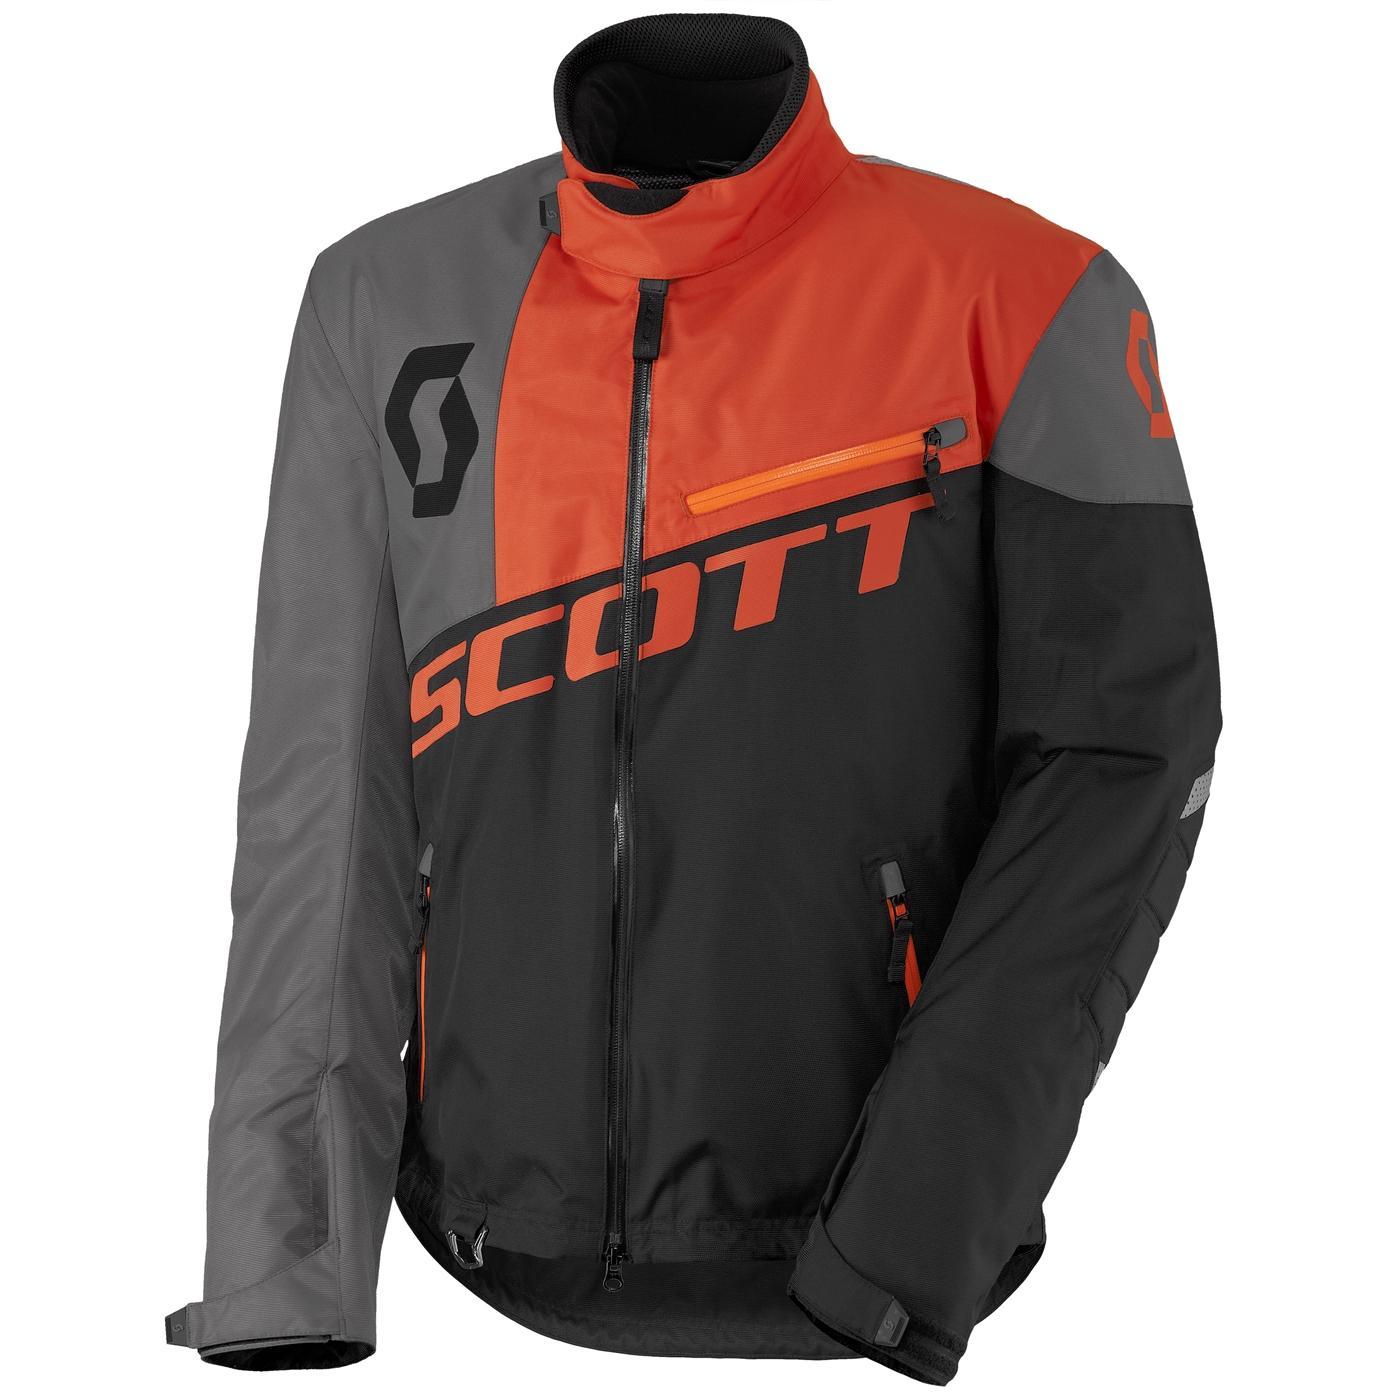 Scott Comp Pro Jakke - Sort/Orange - XS